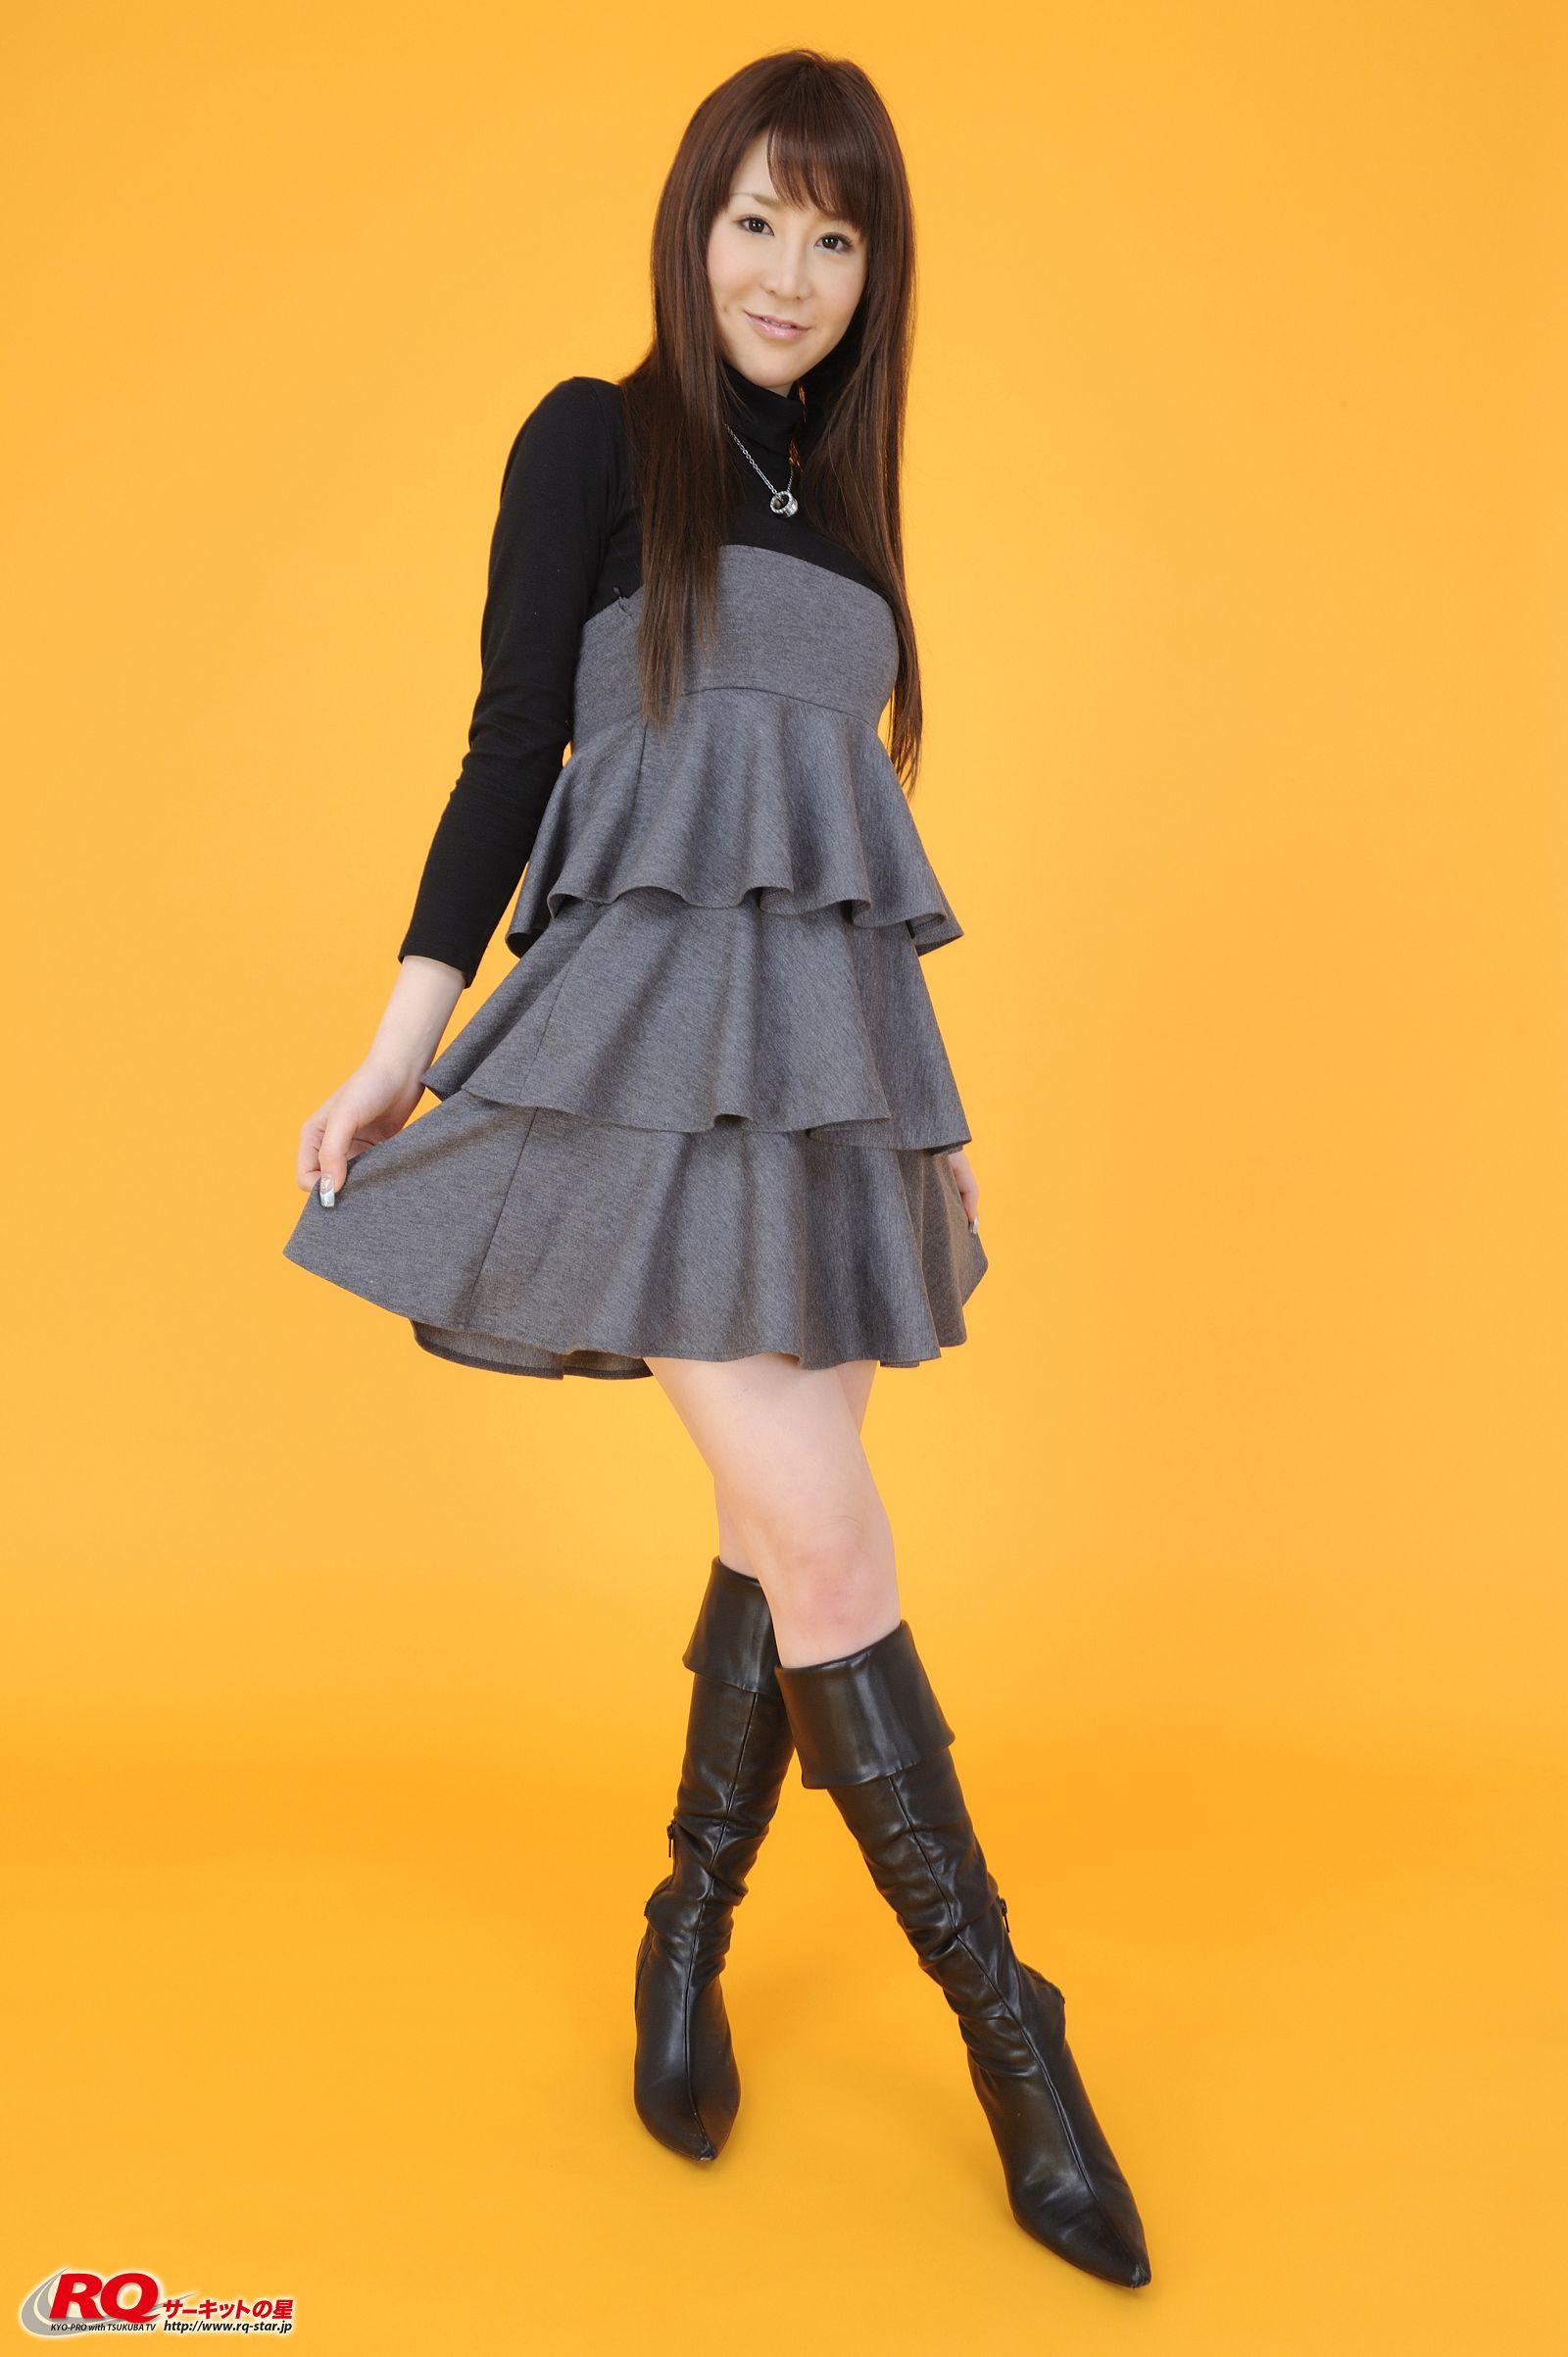 [RQ STAR美女] NO.00122 Yuko Nakamura 中村优子 Private Dress[81P] RQ STAR 第1张